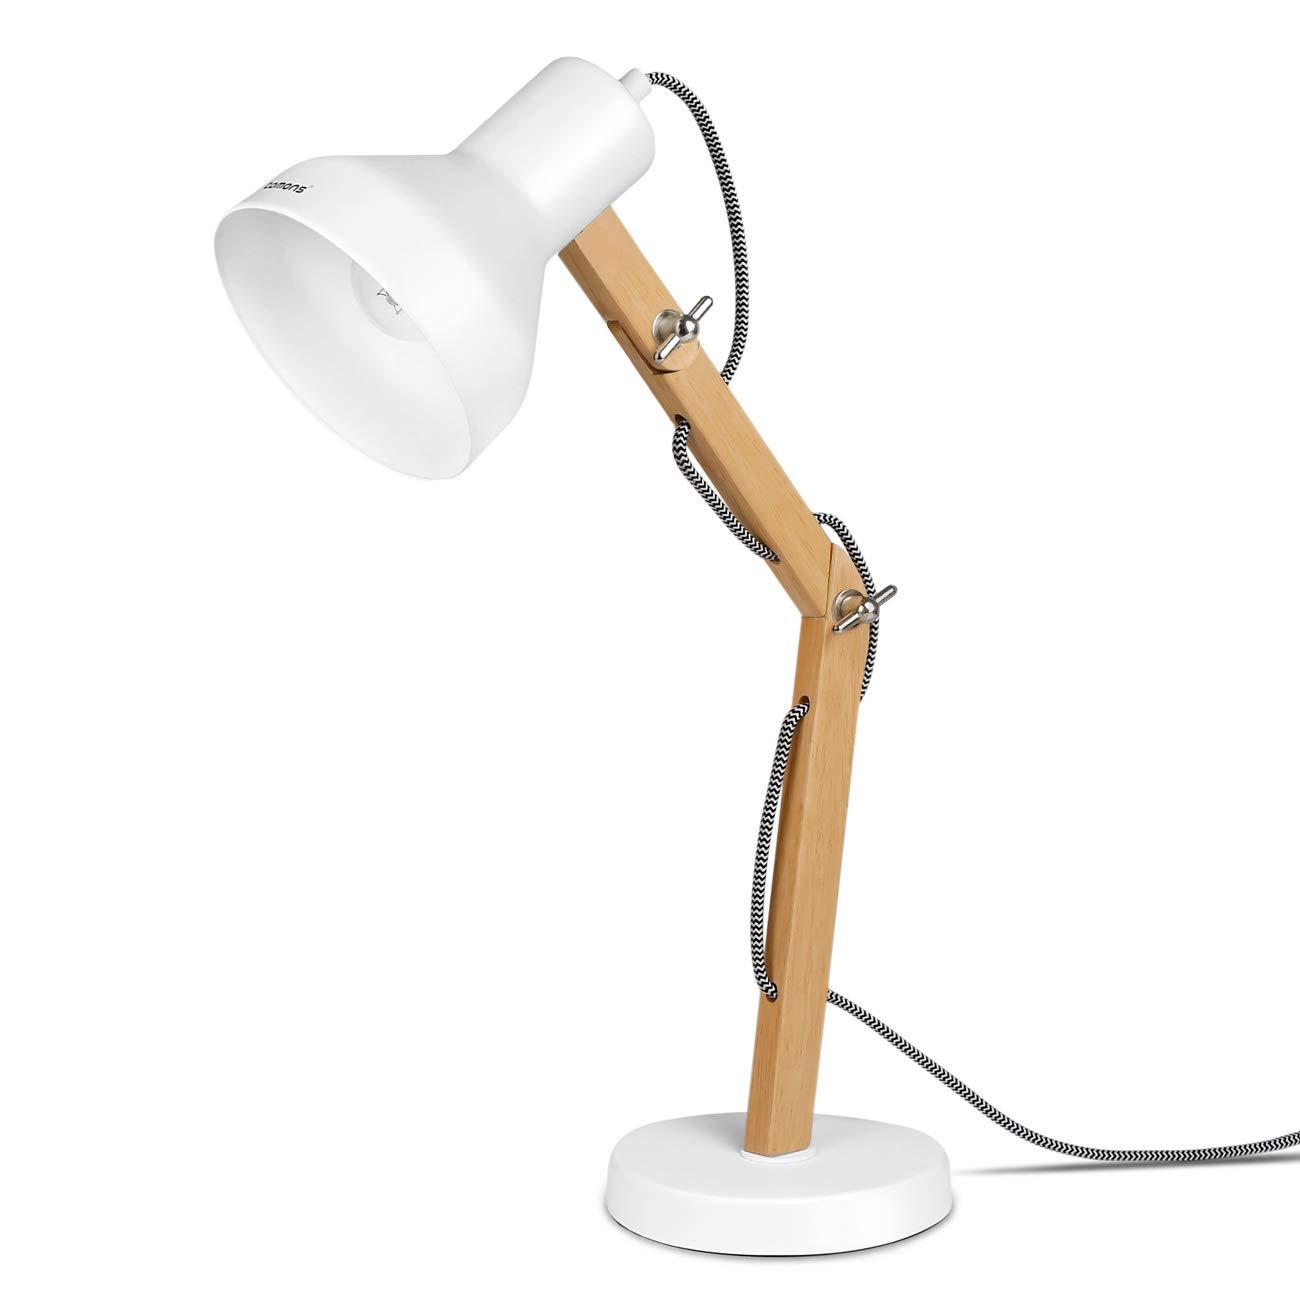 Tomons Wood Adjustable Head Desk Lamp, Designer Table Lamp, Reading Lights, Study Lamp, Work Lamp, Office Lamp, Bedside Nightstand Lamp – White